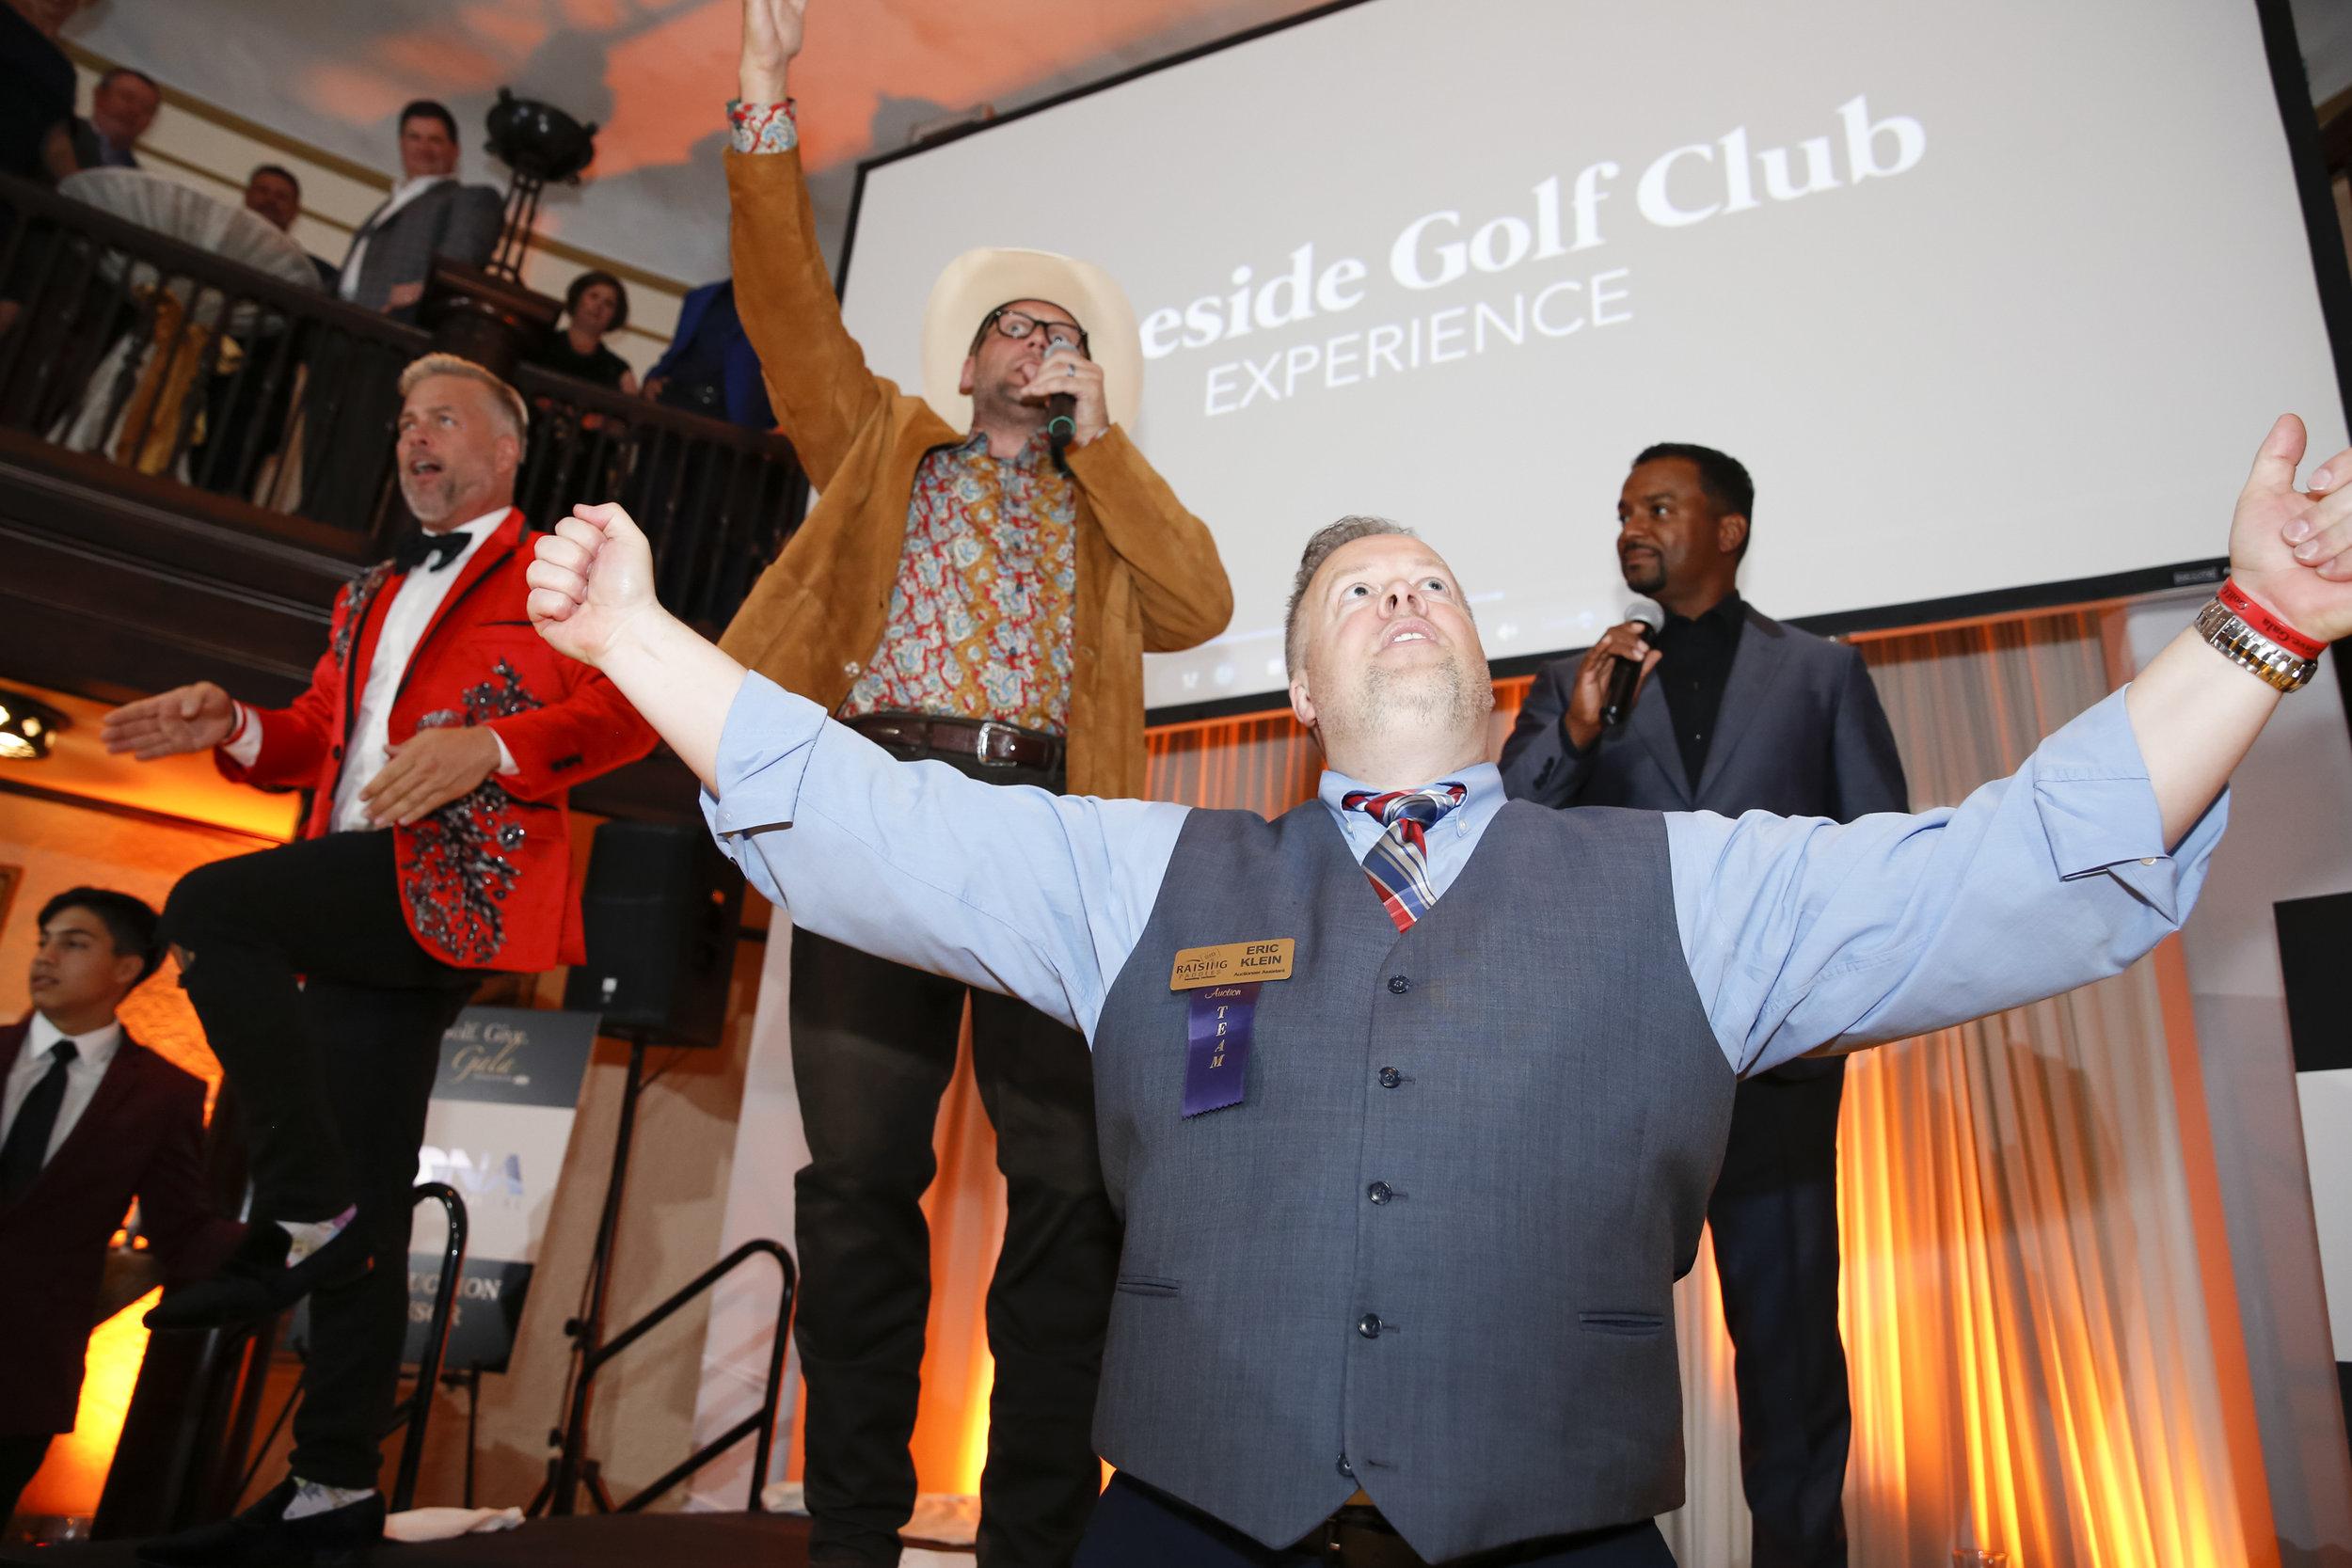 golf-give-gala-celebrity-michael-phelps-jason-day-event-photographer-madison-wi-49.jpg